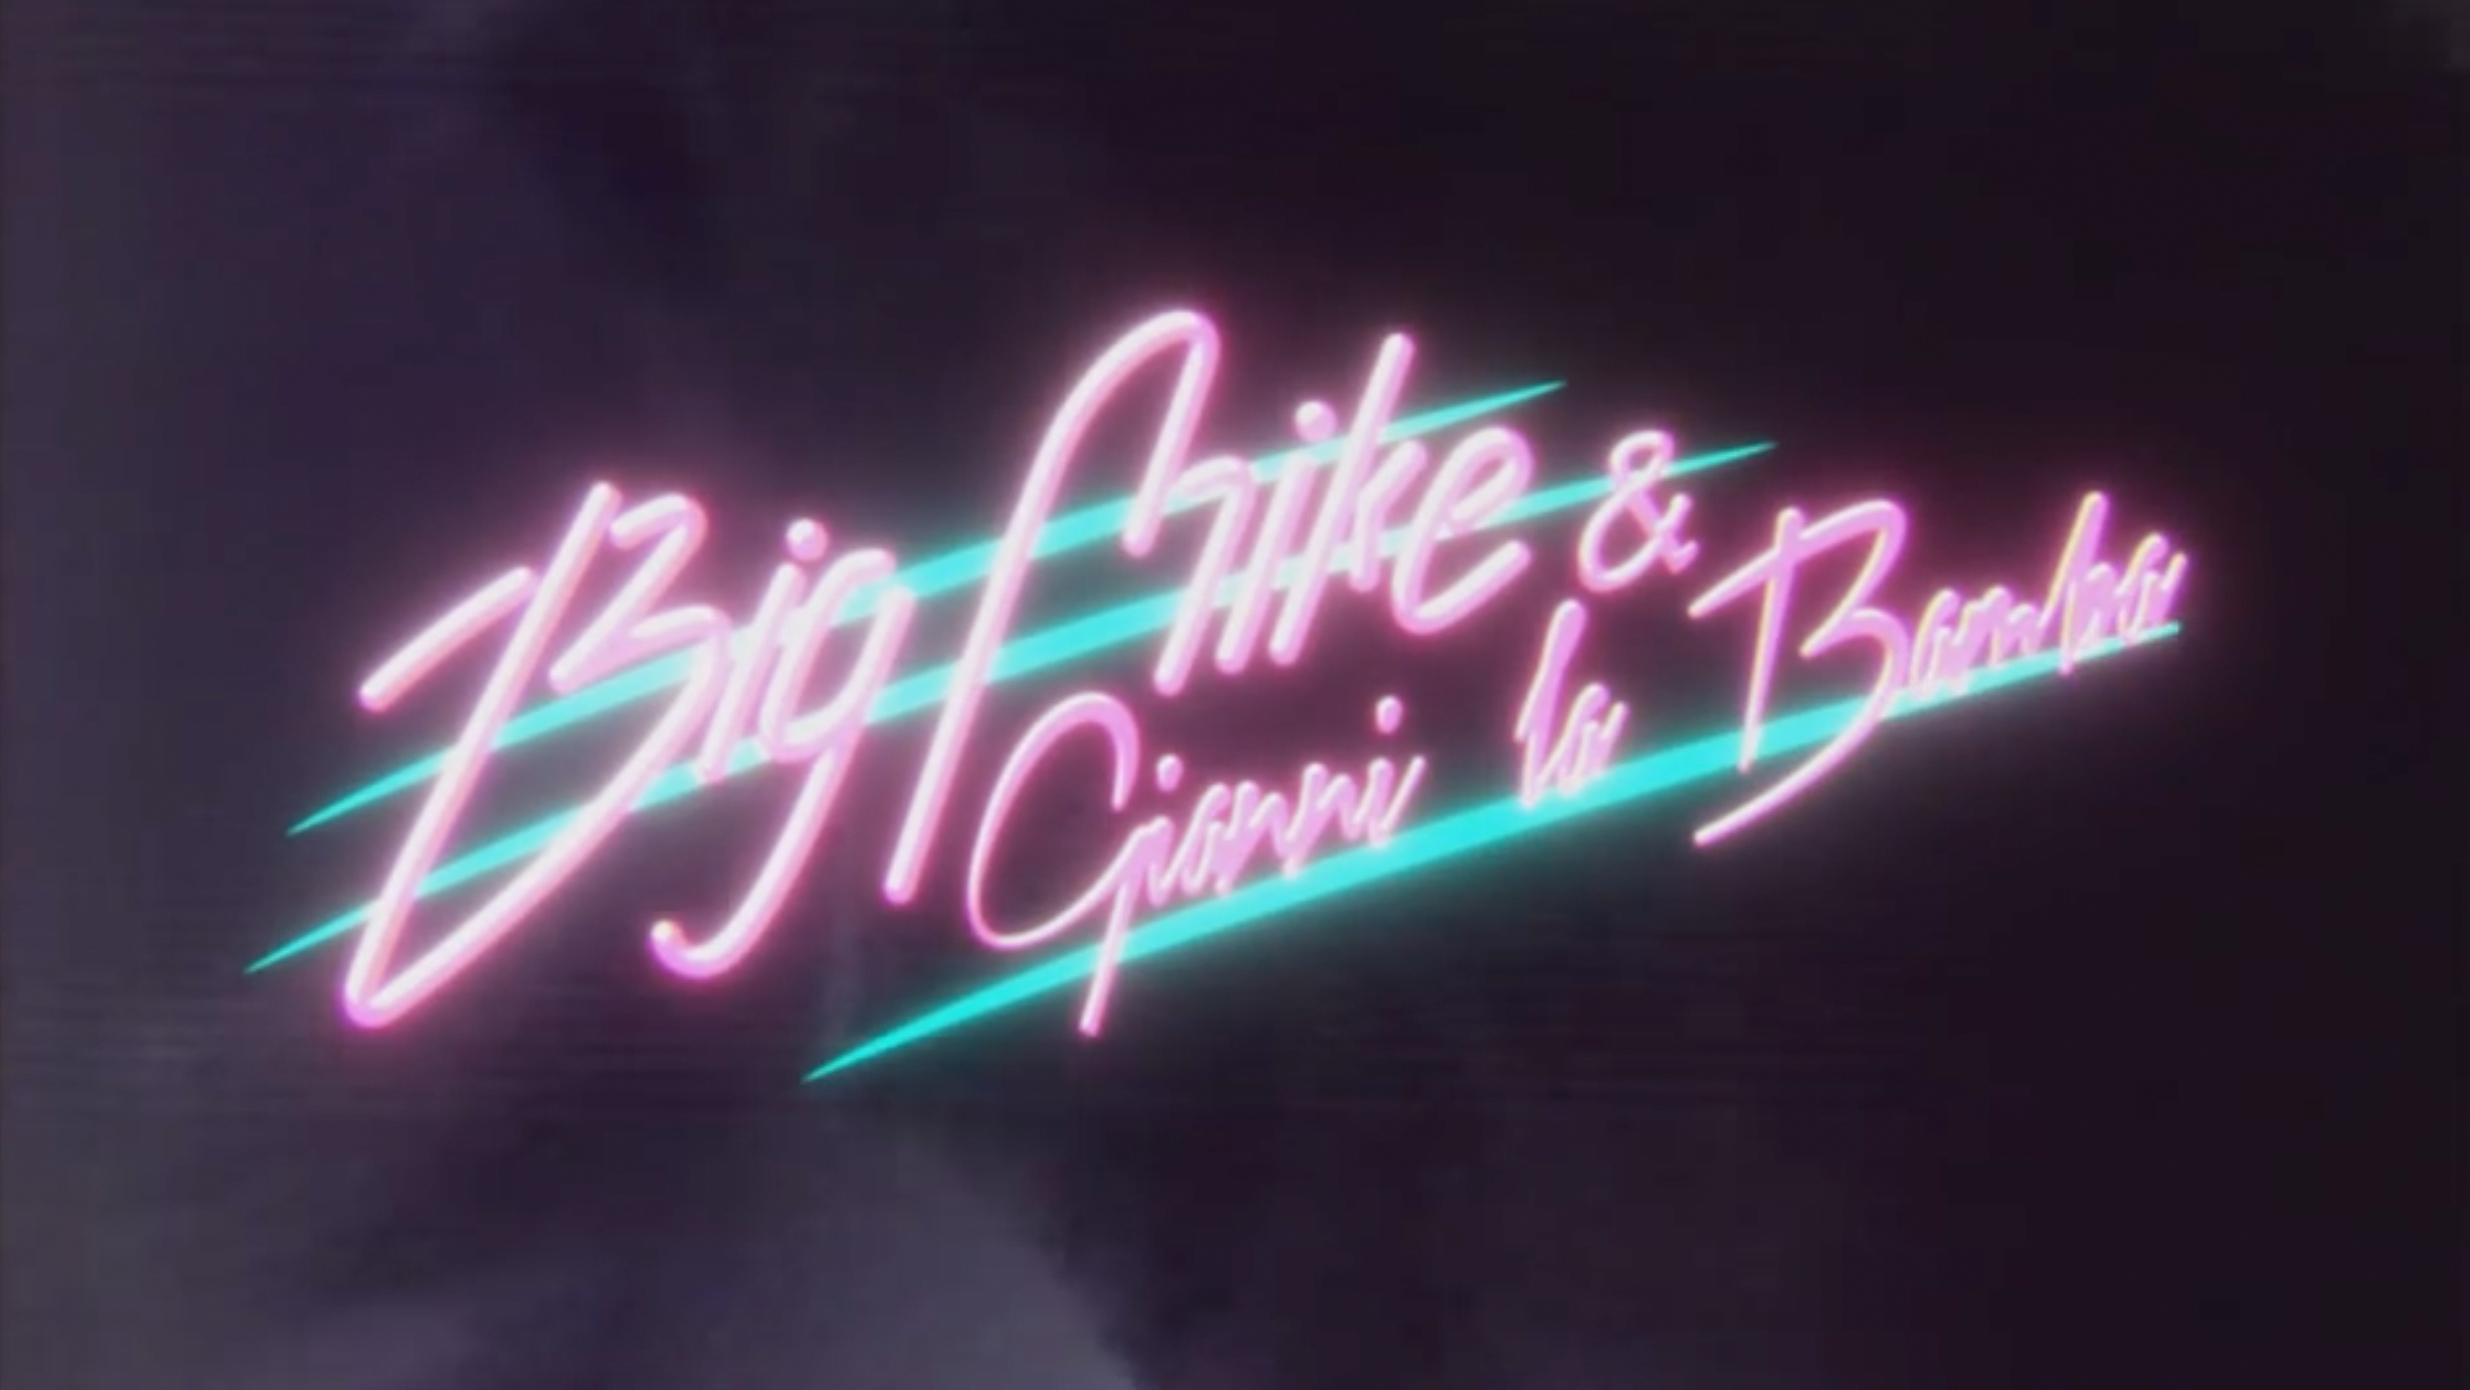 Big Mike - La Kölsche Vita